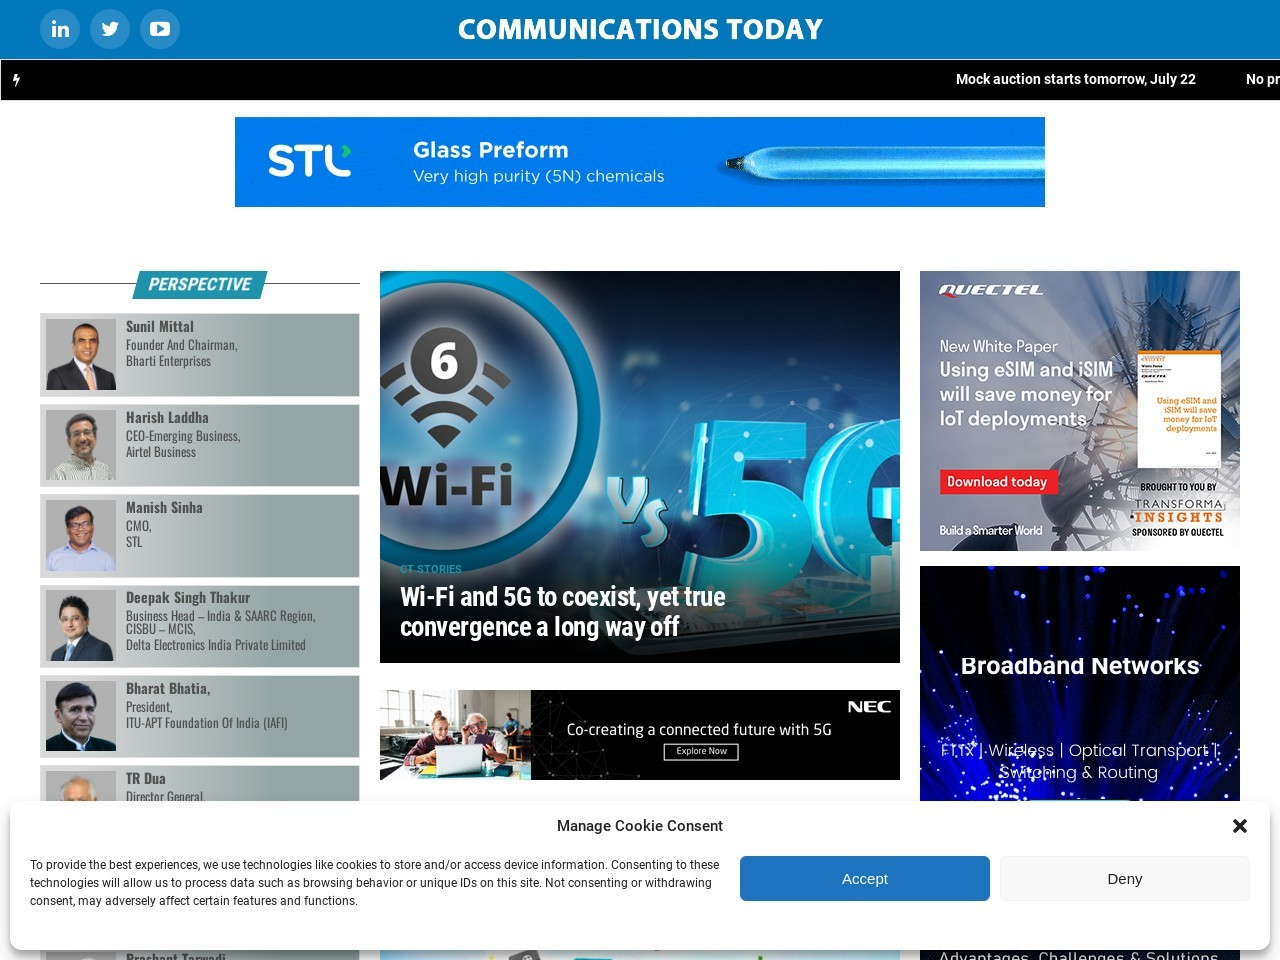 Reliance Jio -Revenue growth fails to impress, ICICI Securities